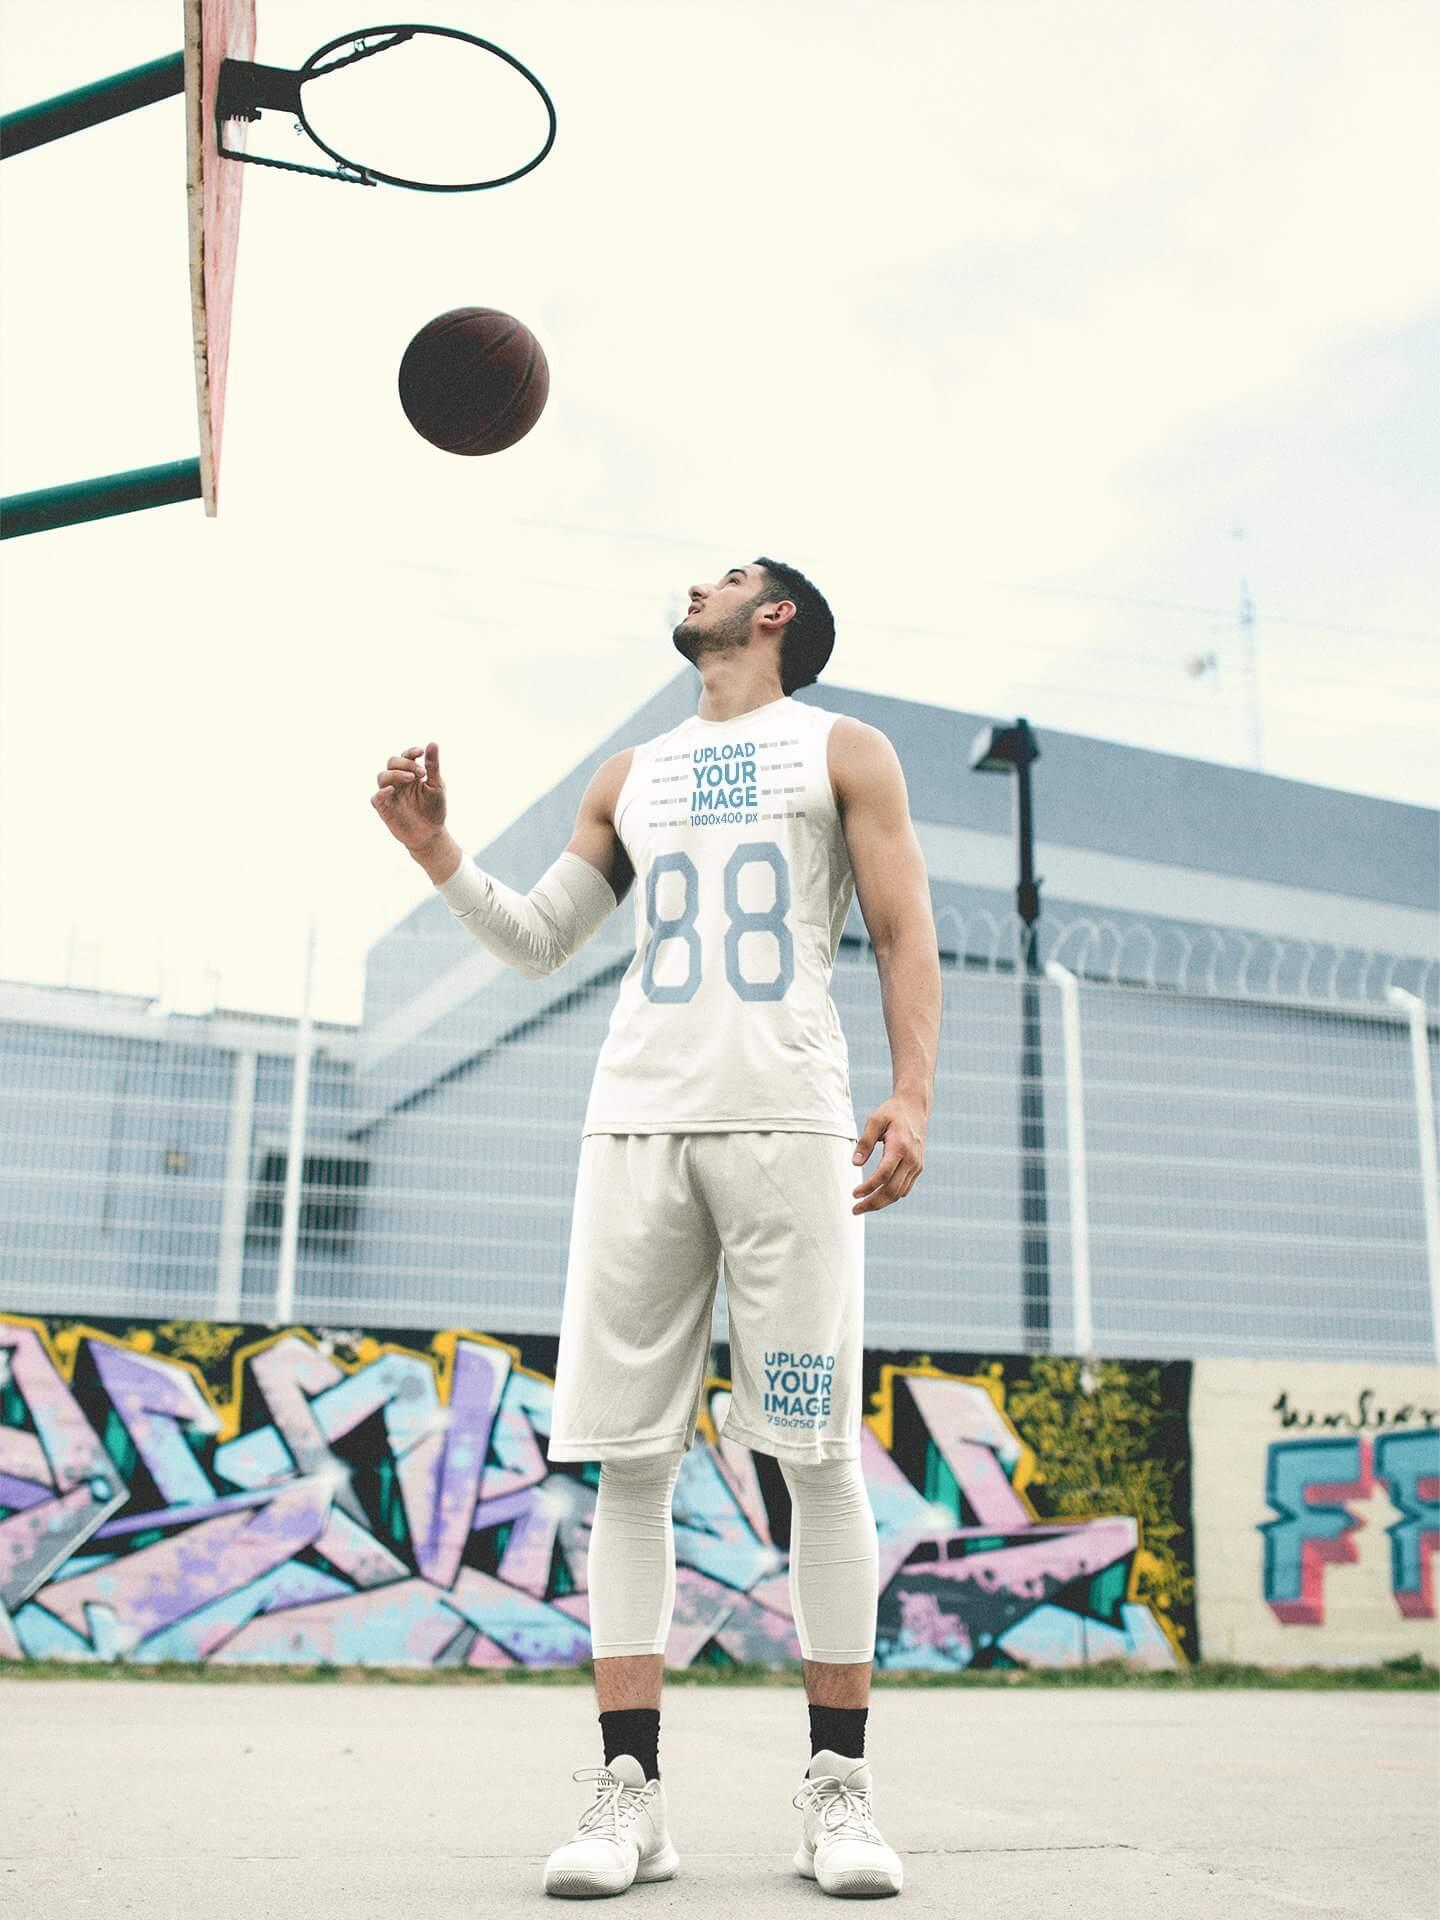 74a01d3dadfb Best Basketball Jersey Makers - Placeit Blog